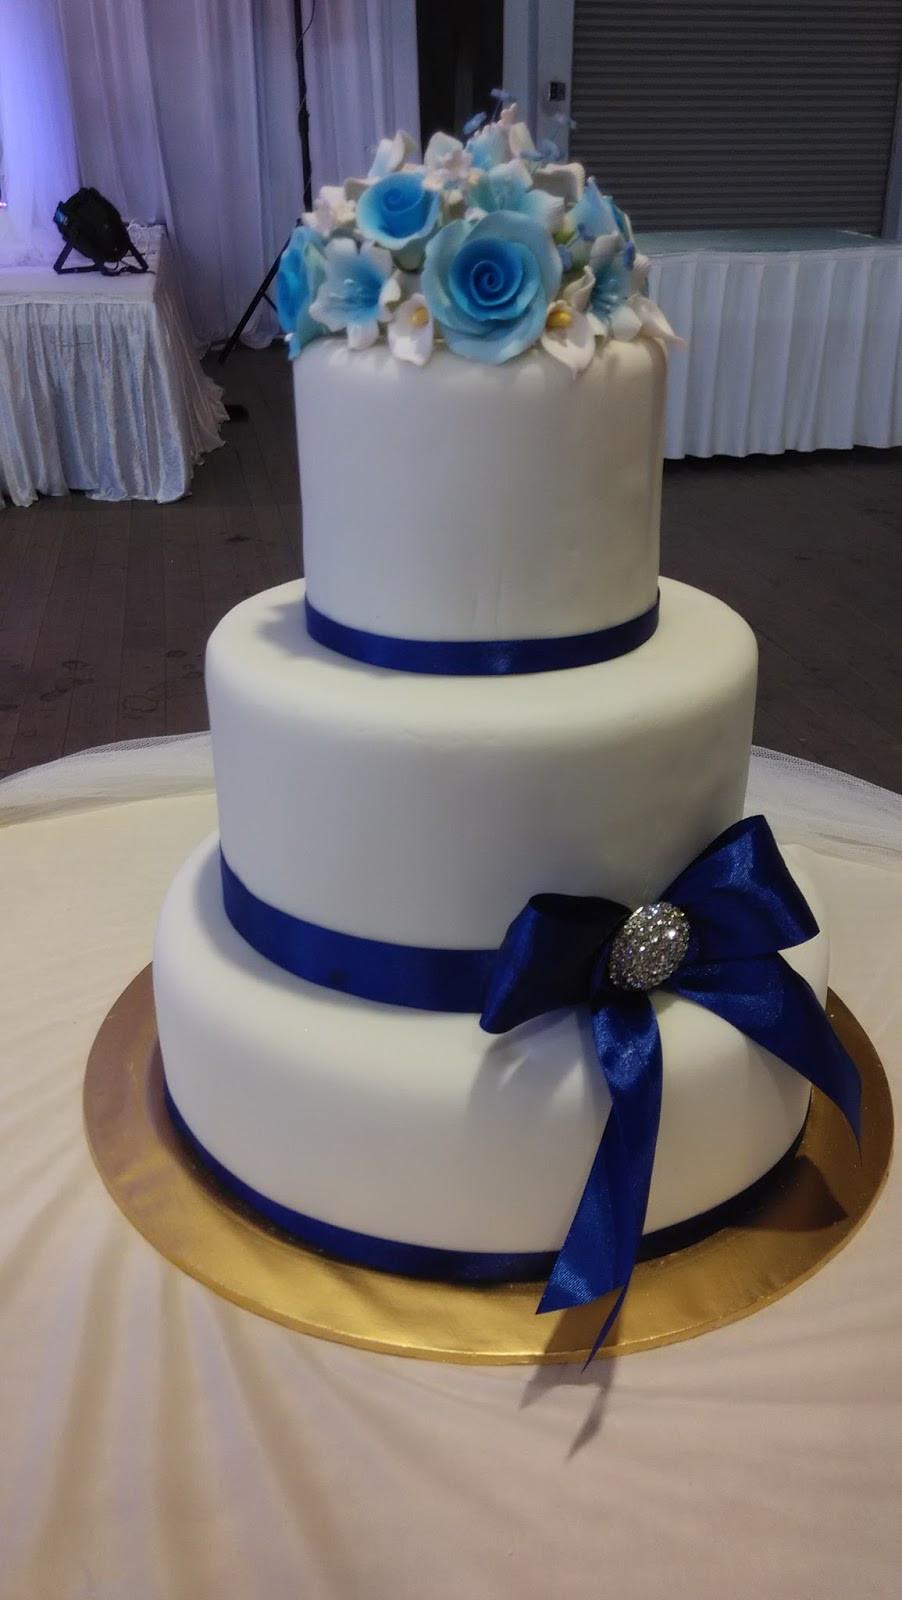 Wedding Cakes Royal Blue  jujucupcakes Royal Blue and Purple themed wedding cakes